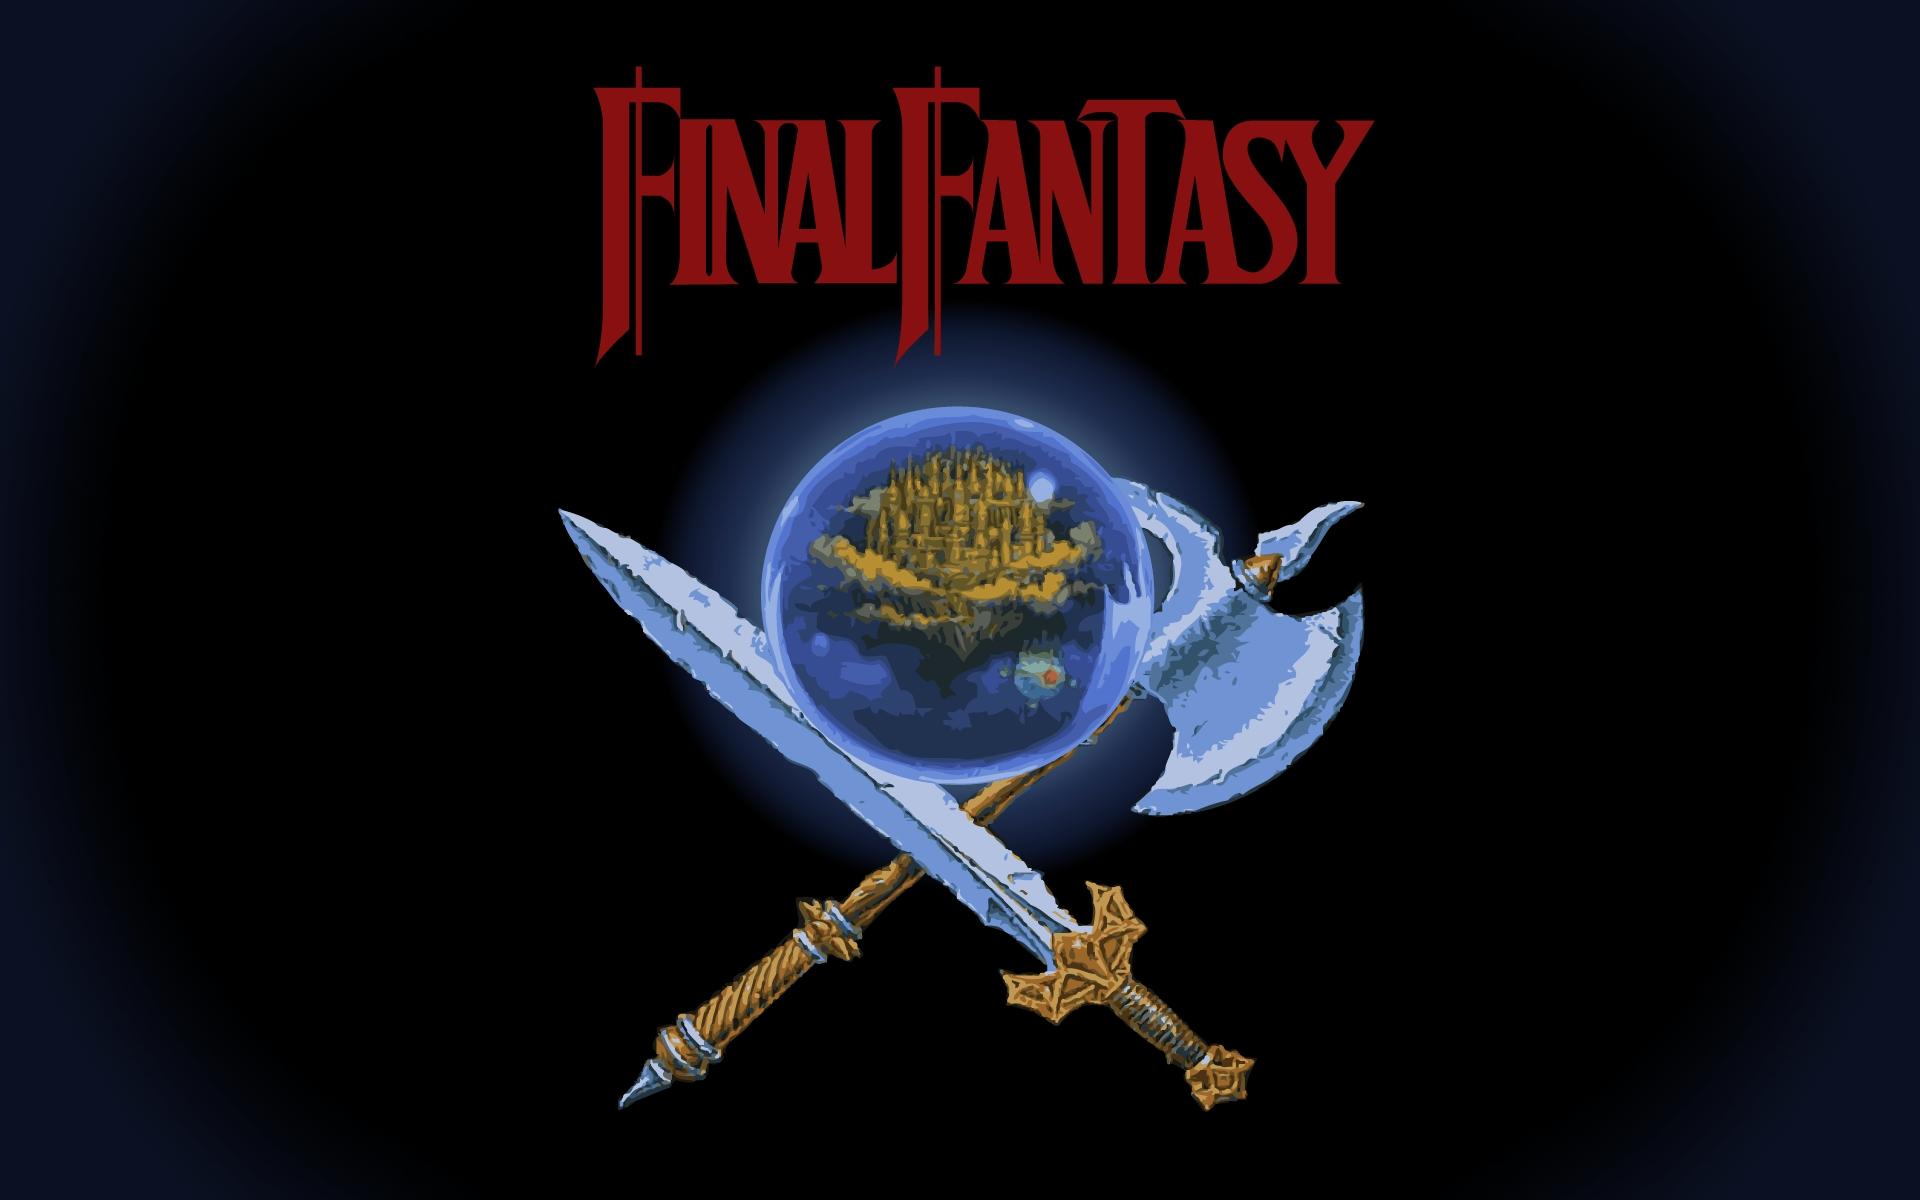 final fantasy 1 wallpapers - wallpaper cave